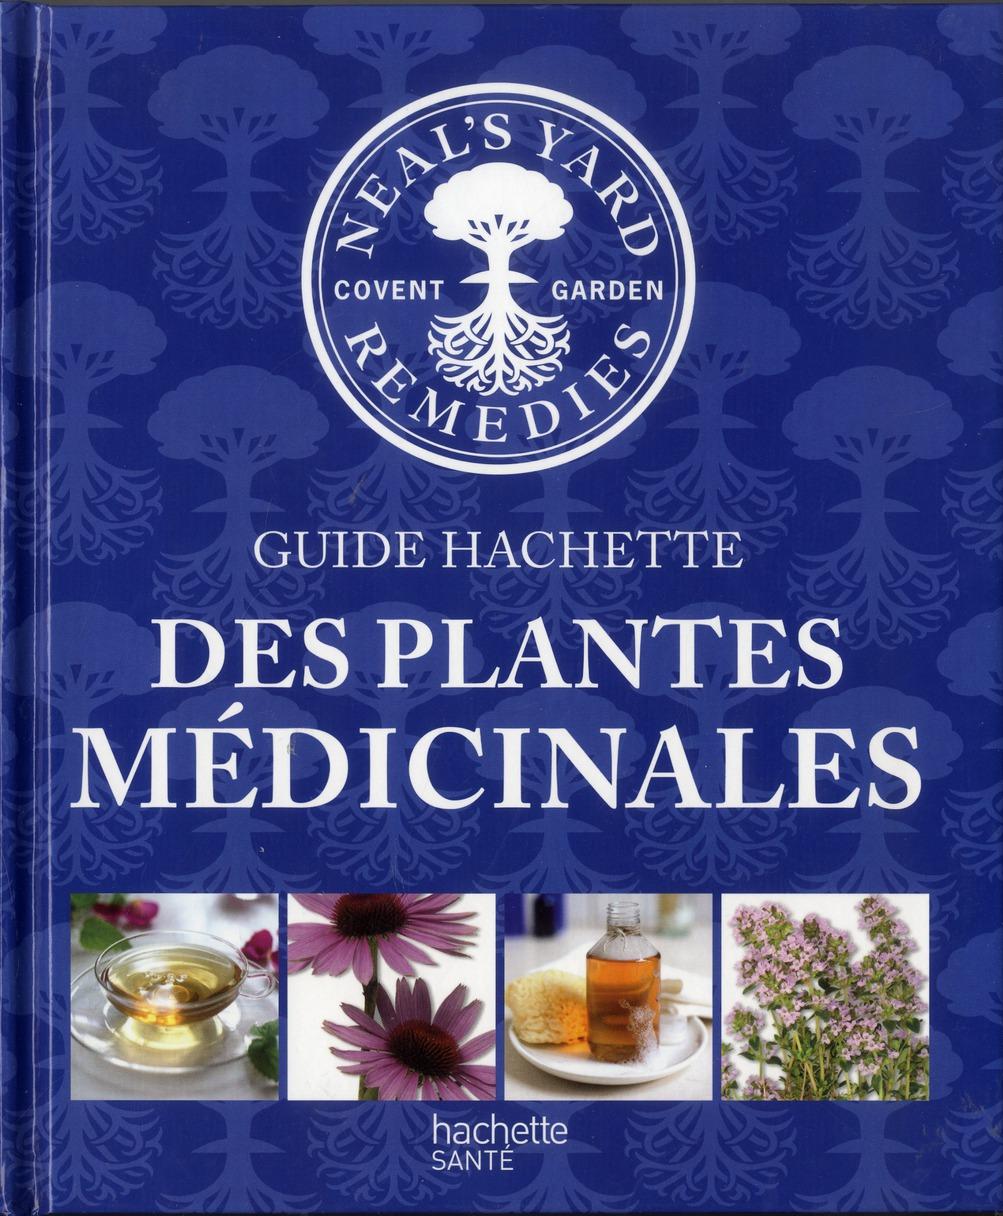 Guide Hachette Des Plantes Medicinales